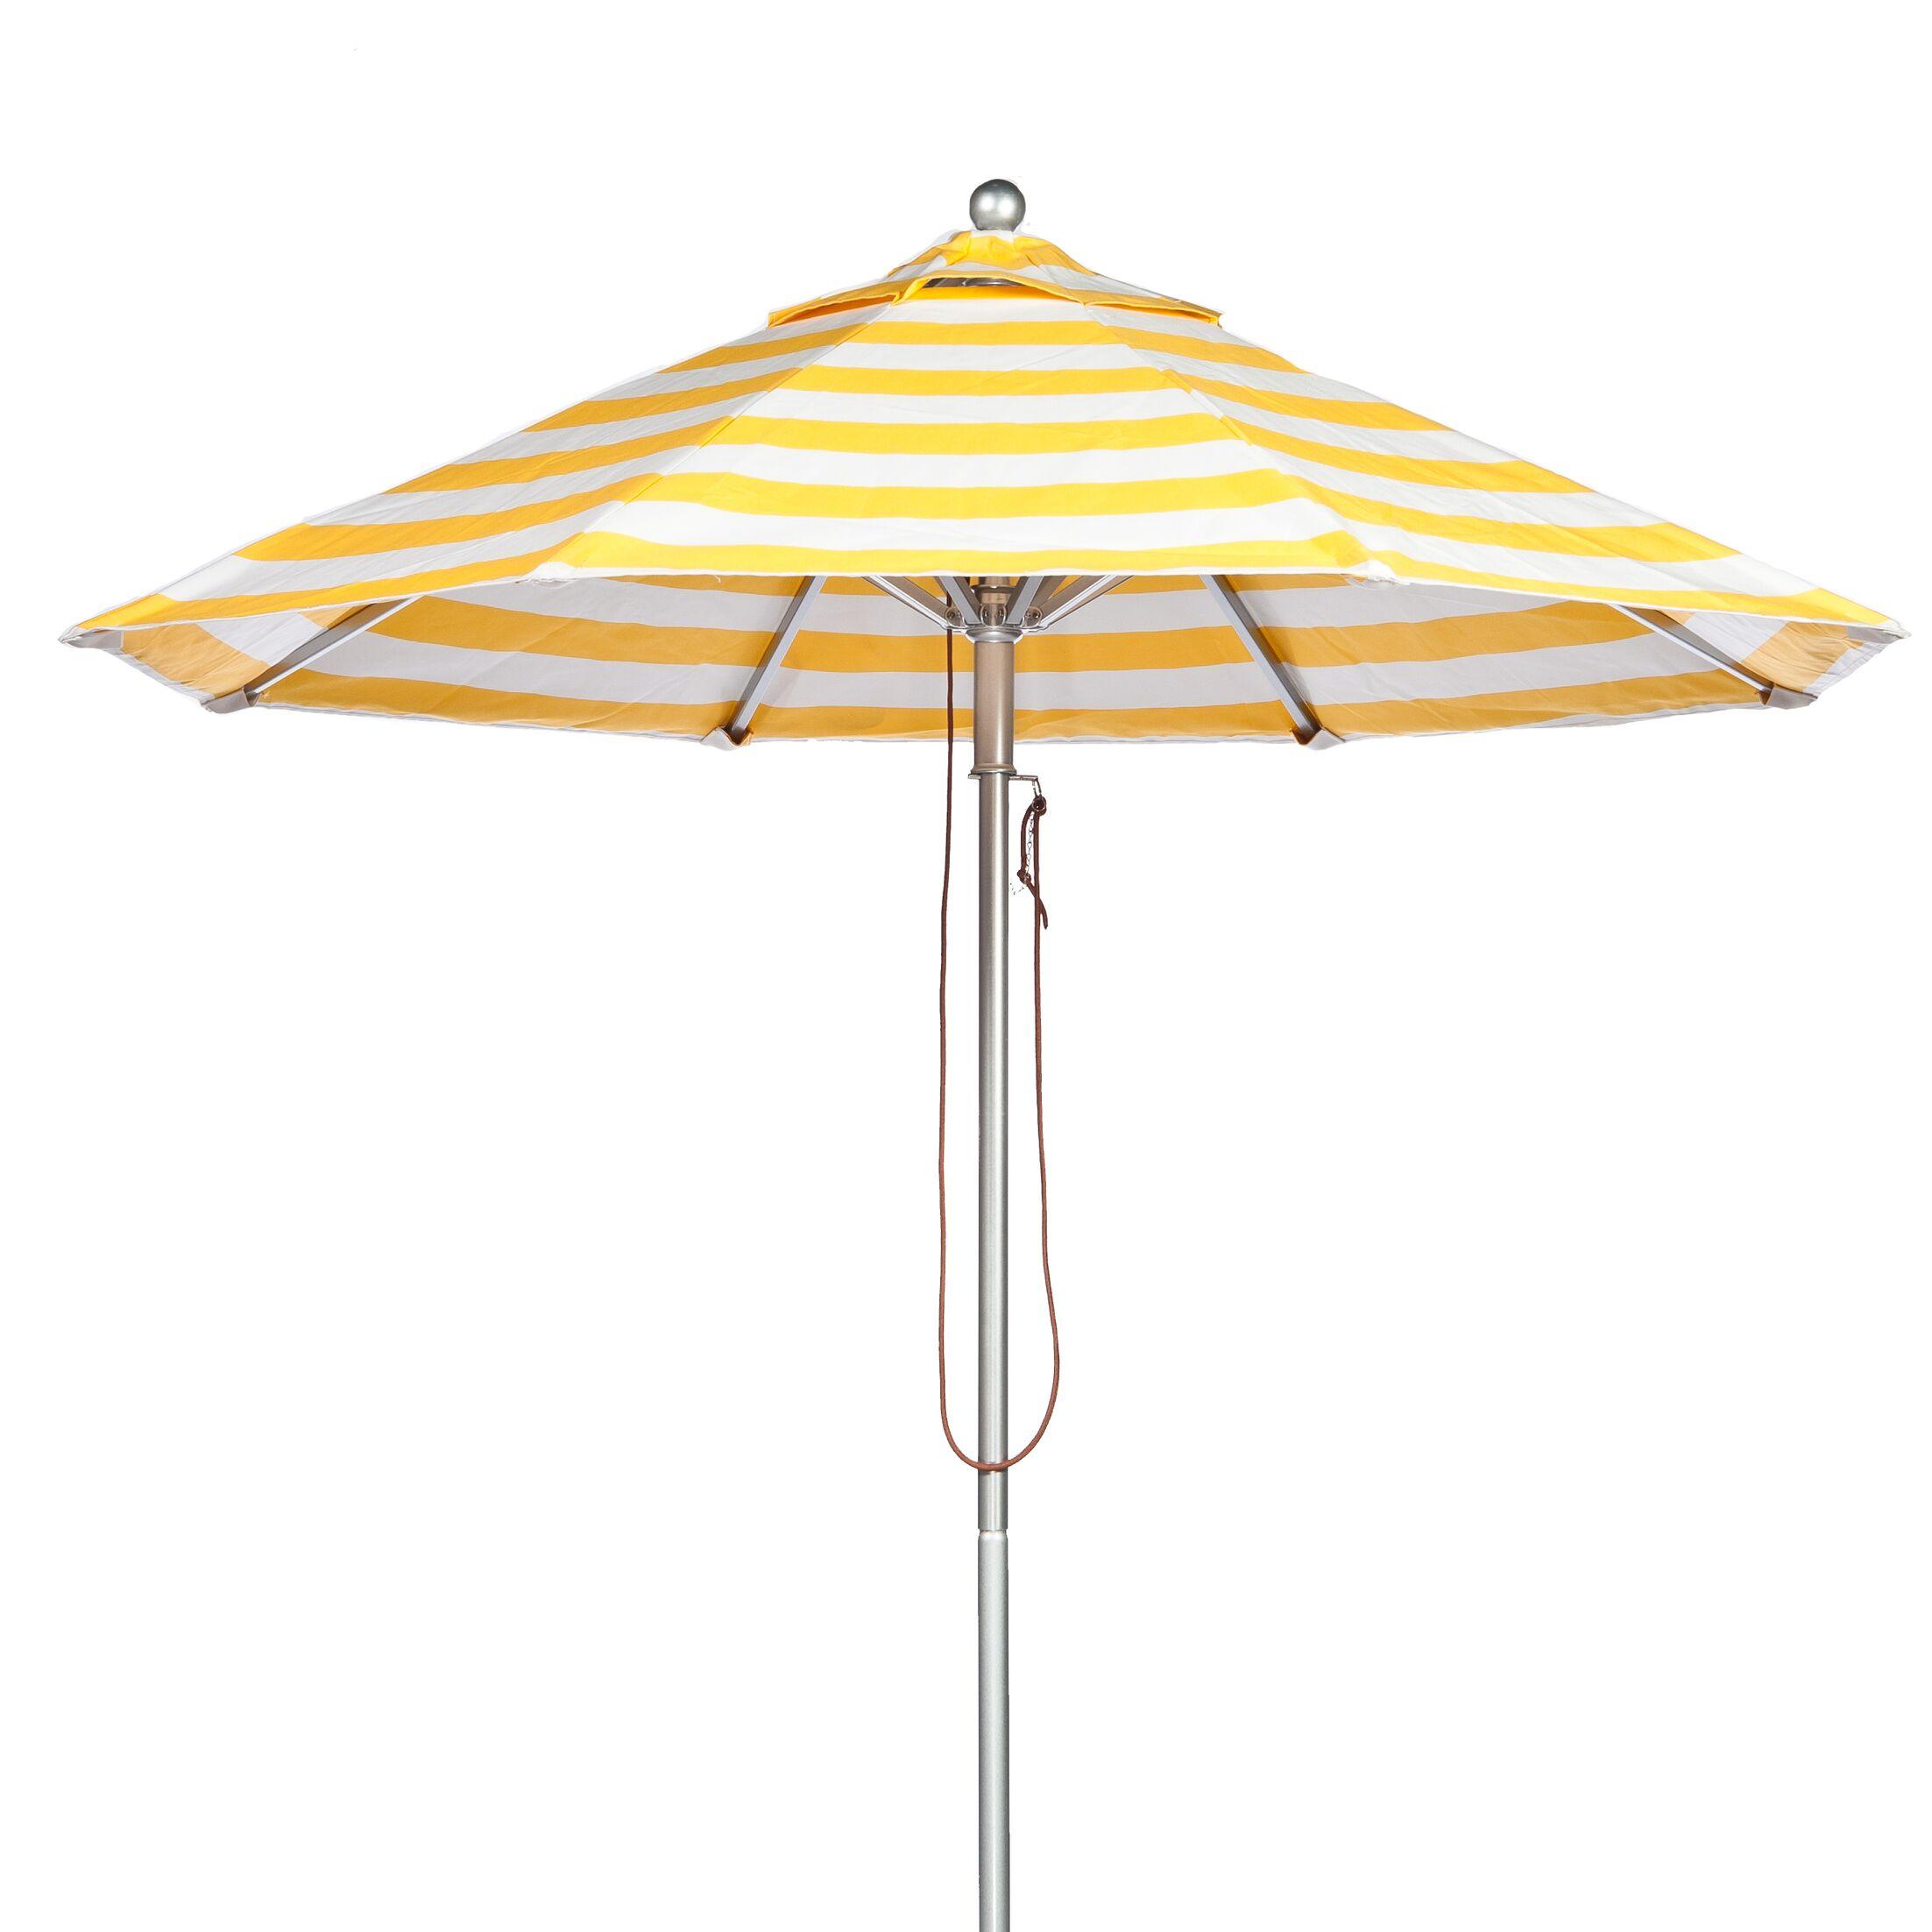 11' Market Umbrella Fabric: Yellow and White Stripe